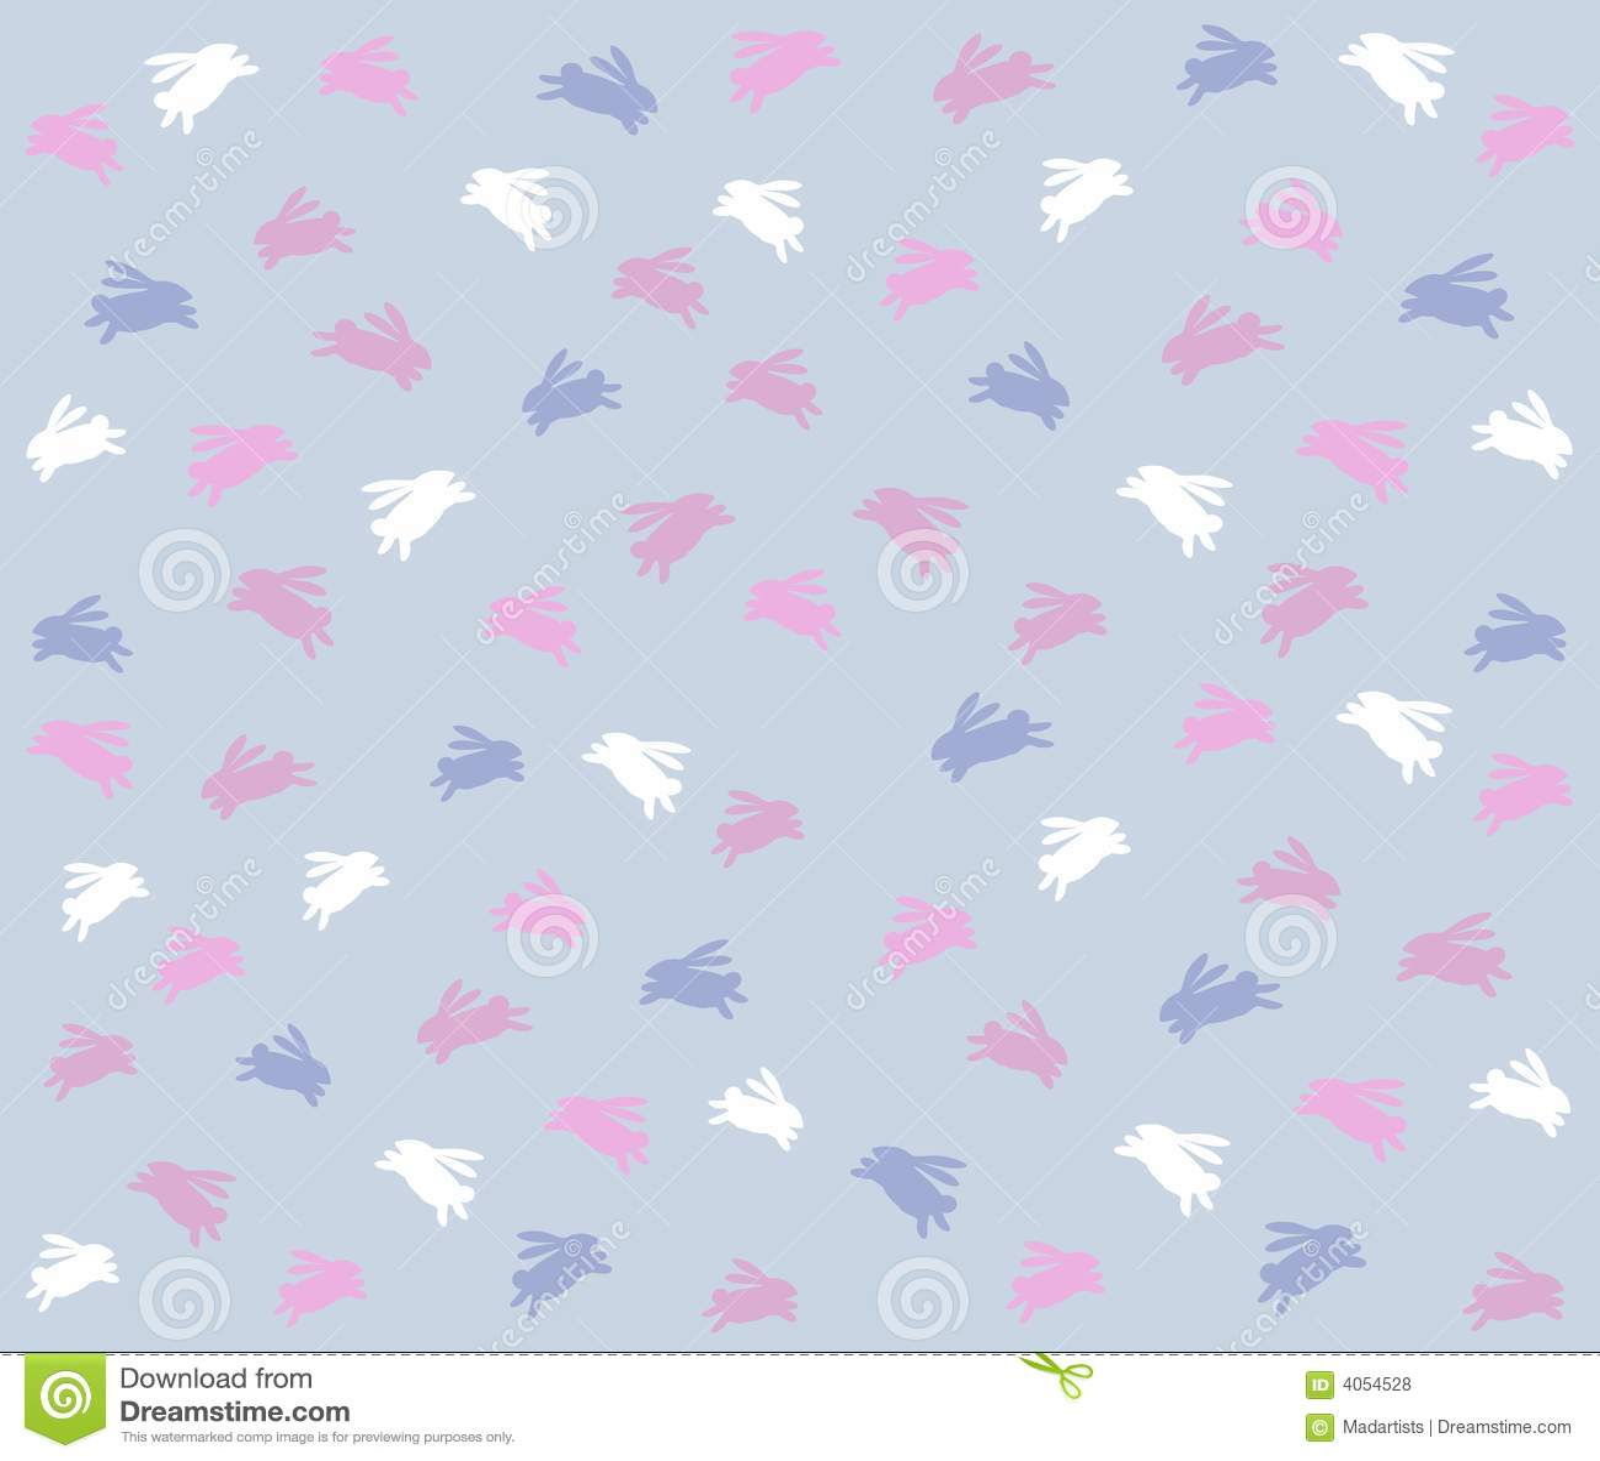 Animal Print Iphone 5 Wallpaper Blue Easter Bunny Background Pattern Stock Illustration